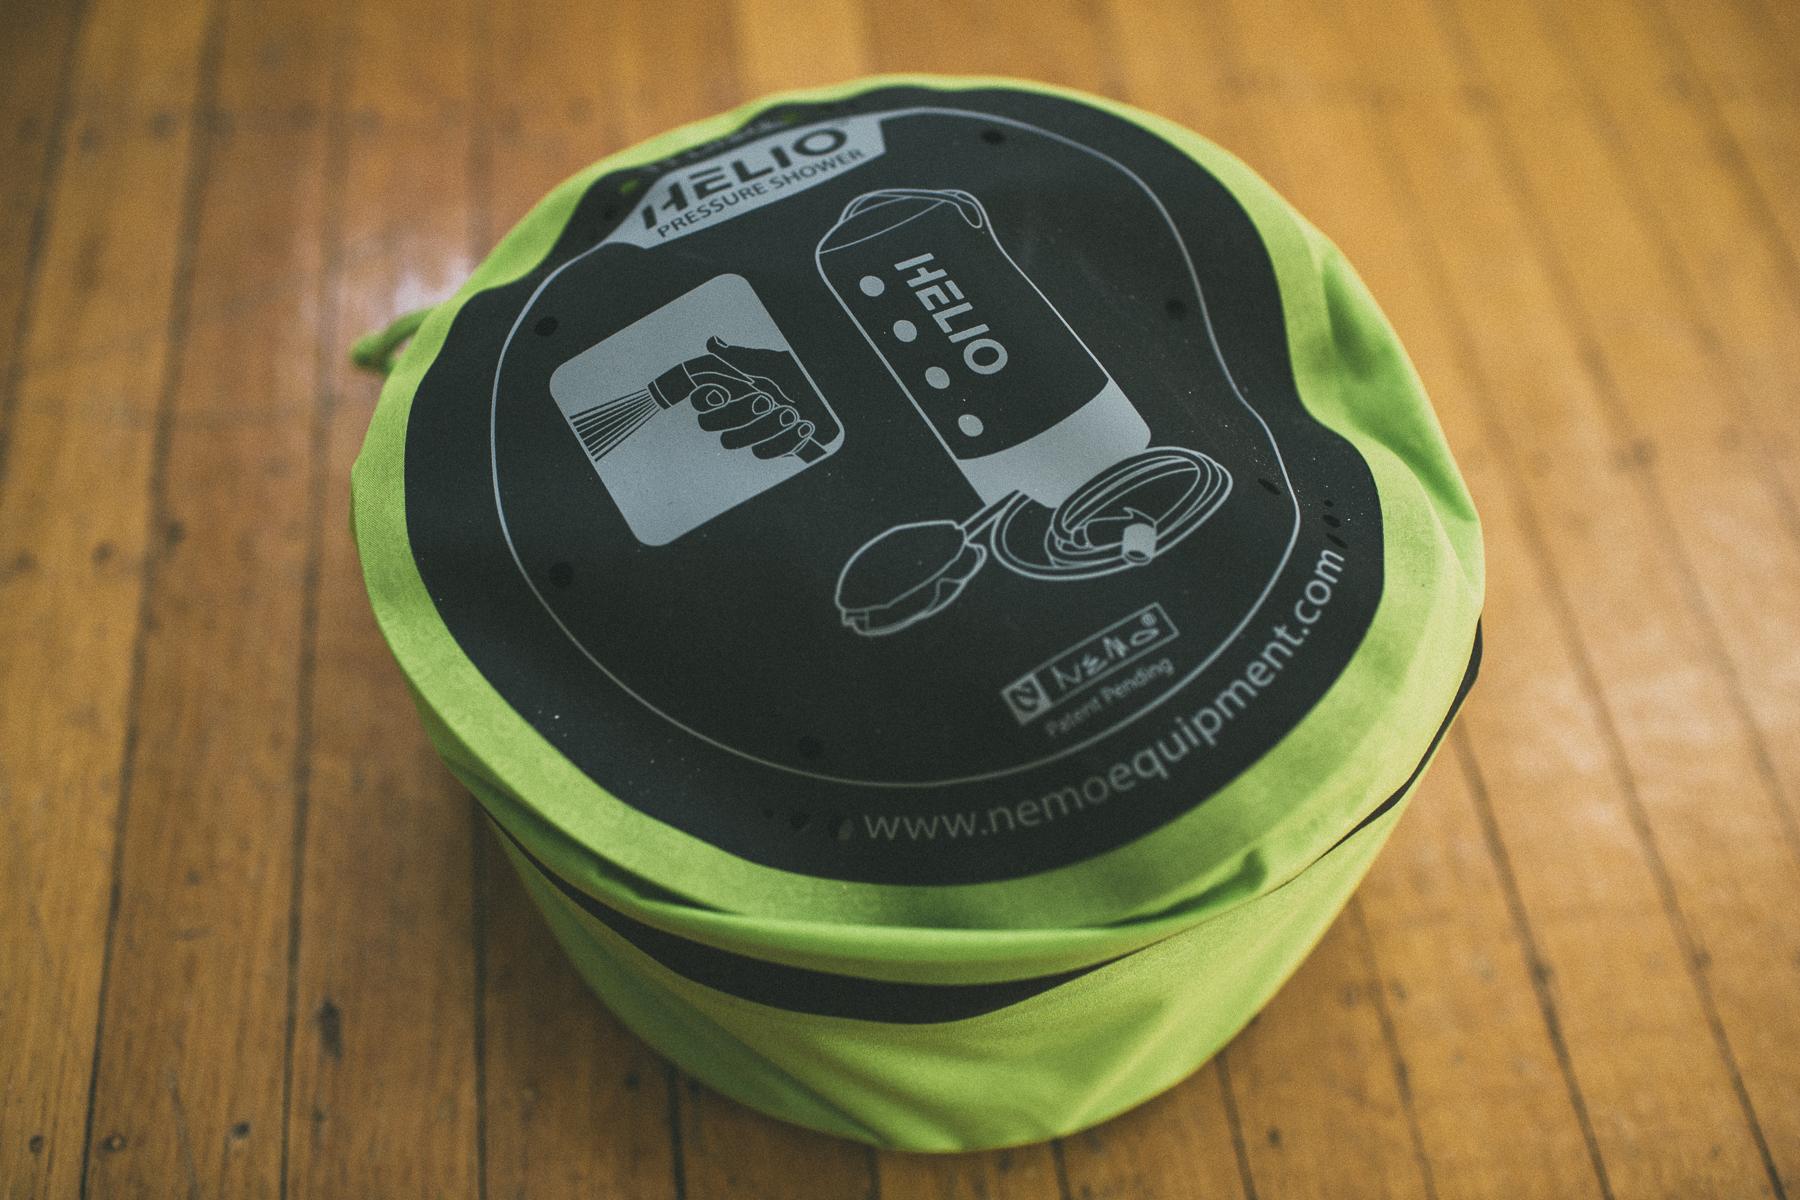 Helio pressure shower by nemo equipment